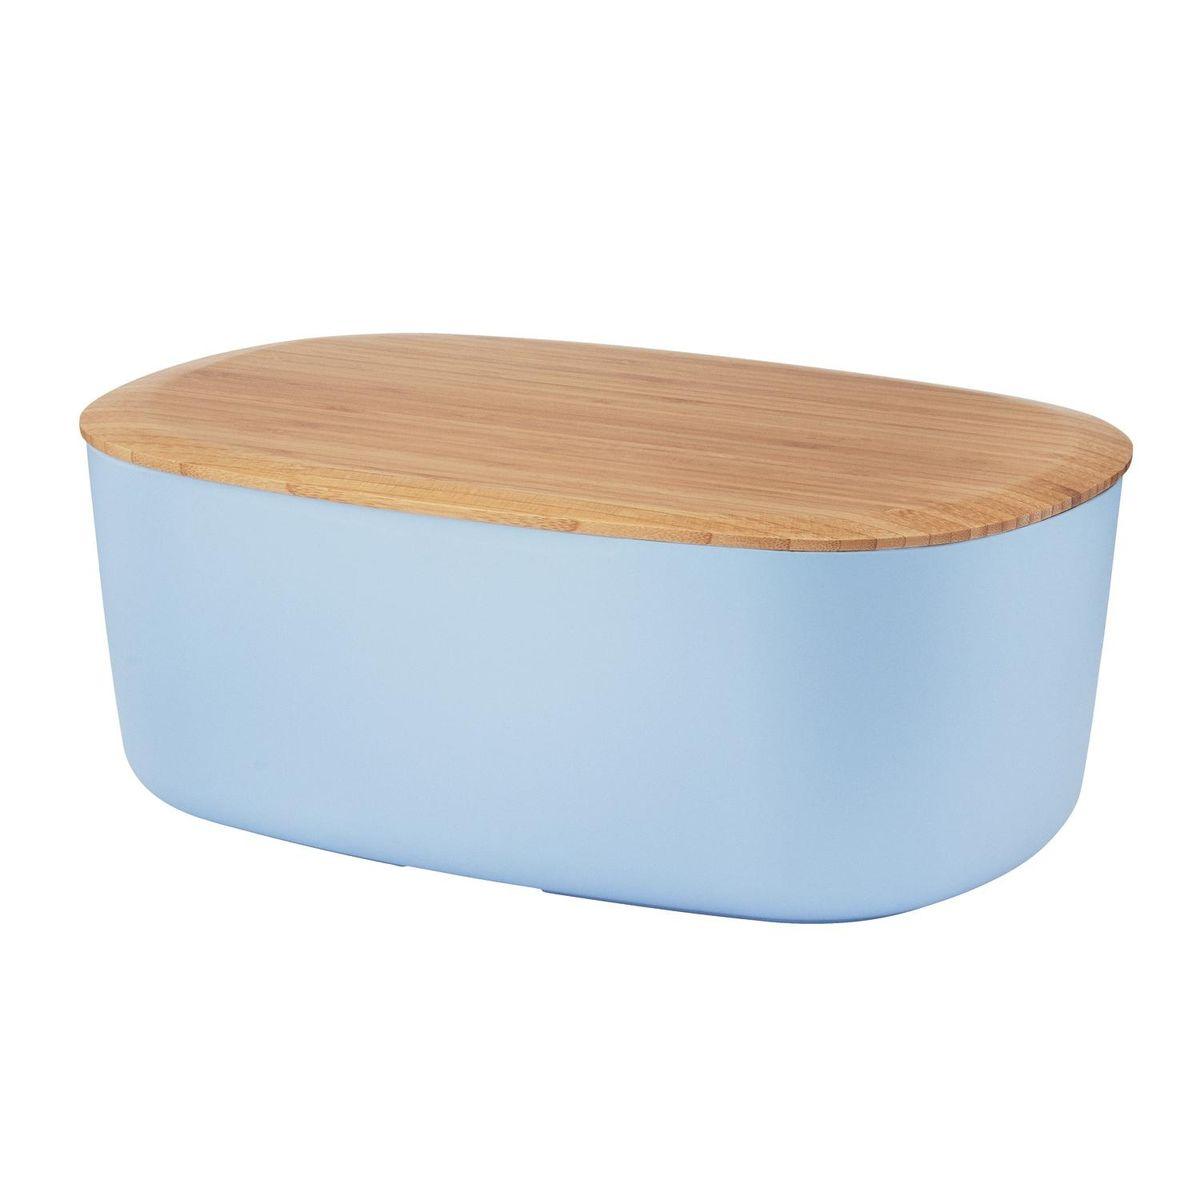 rig tig box it brotkasten rig tig. Black Bedroom Furniture Sets. Home Design Ideas